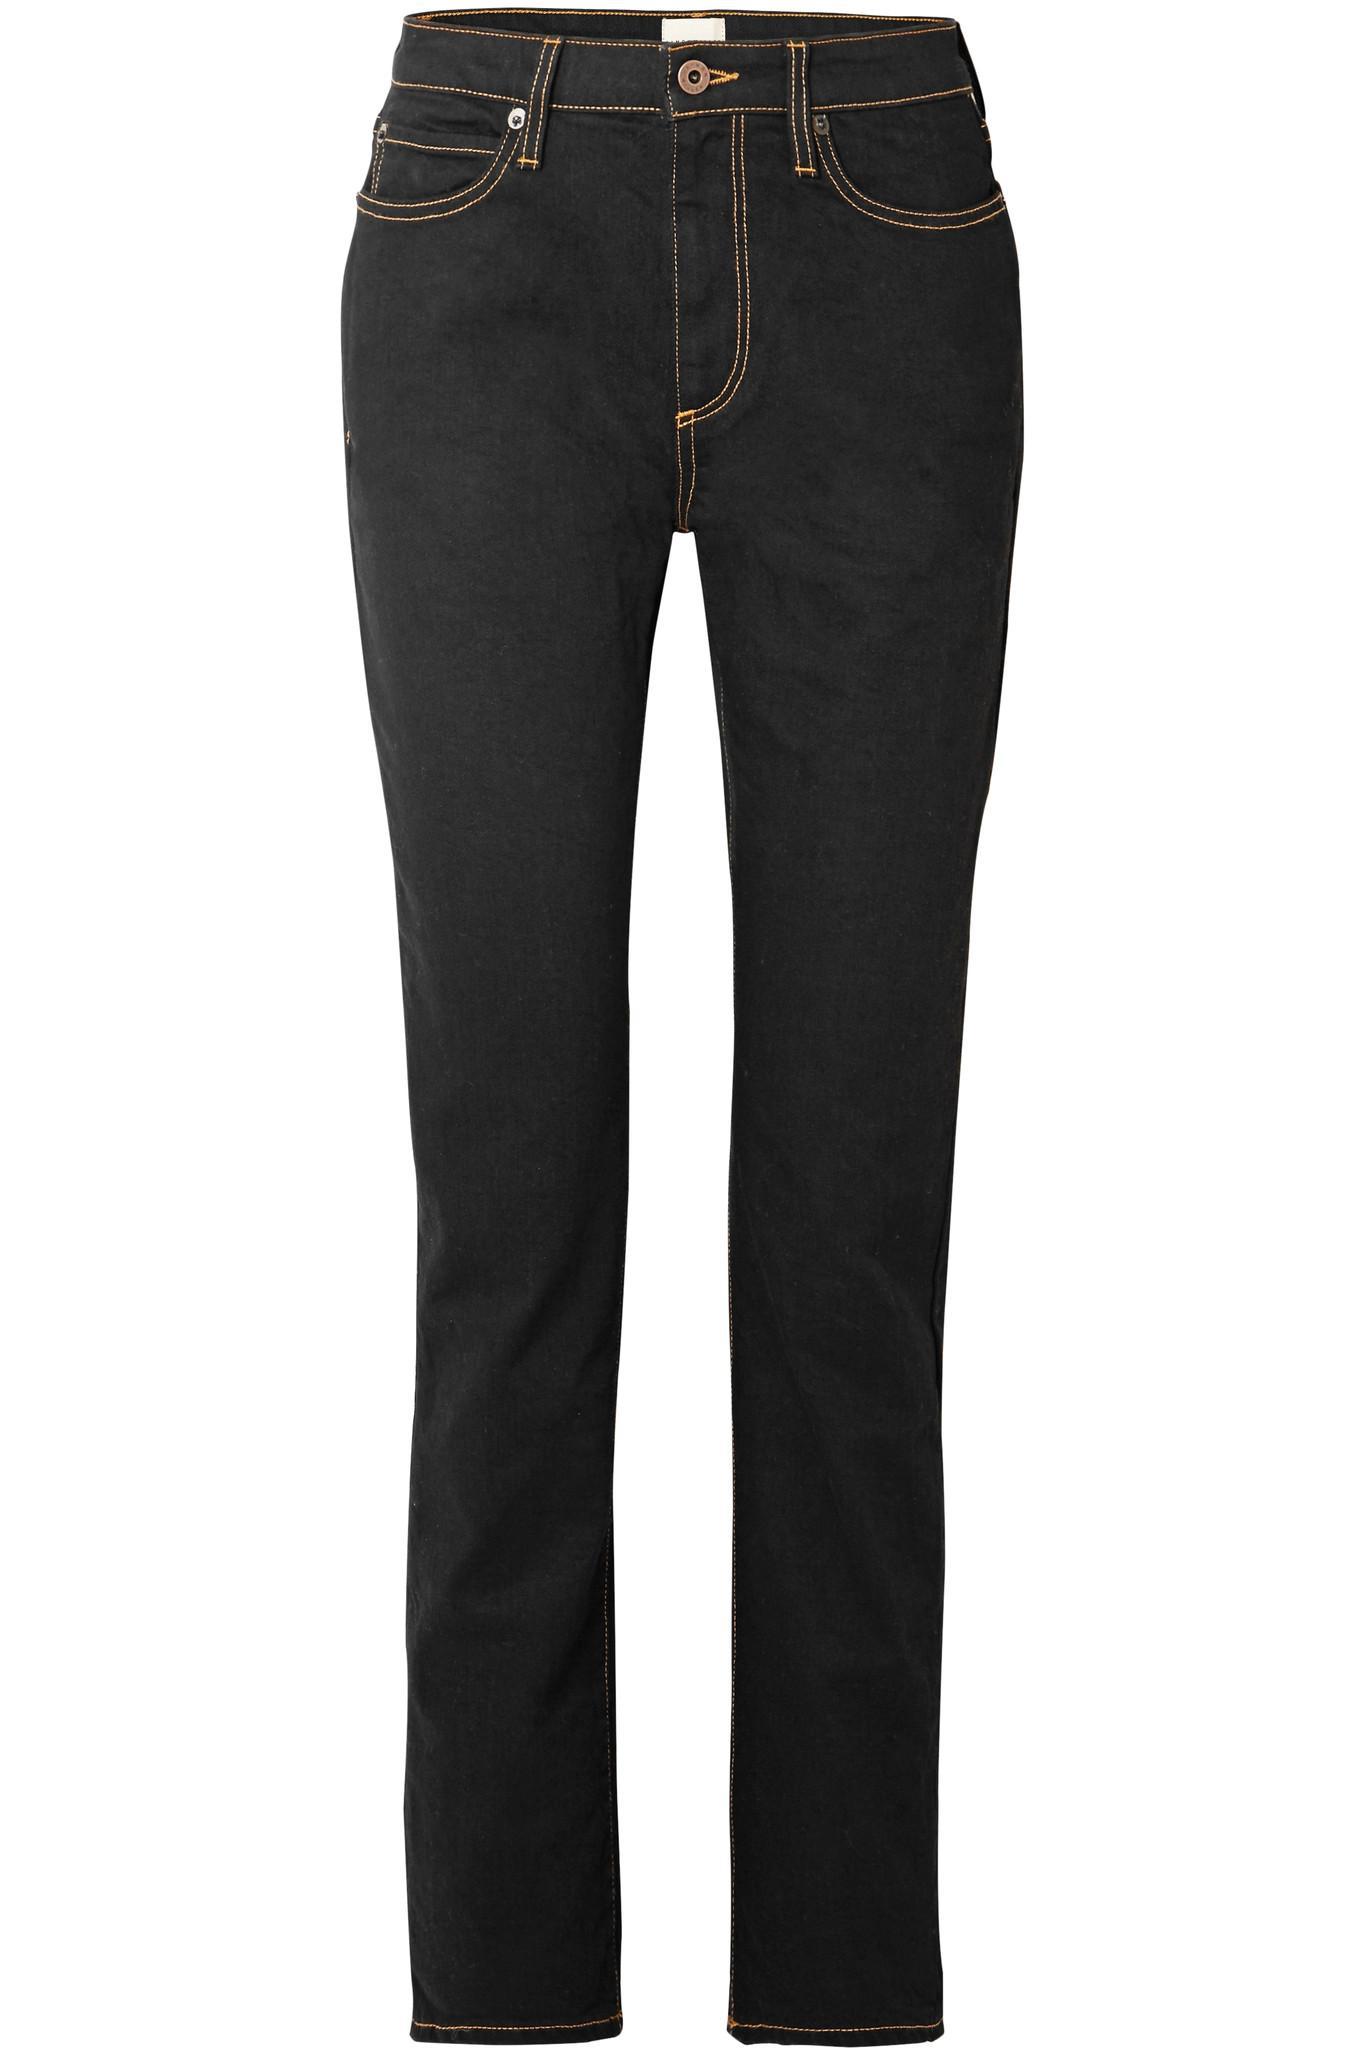 W009 Dever High-rise Slim-leg Jeans - Black Simon Miller vvvXIun3UA